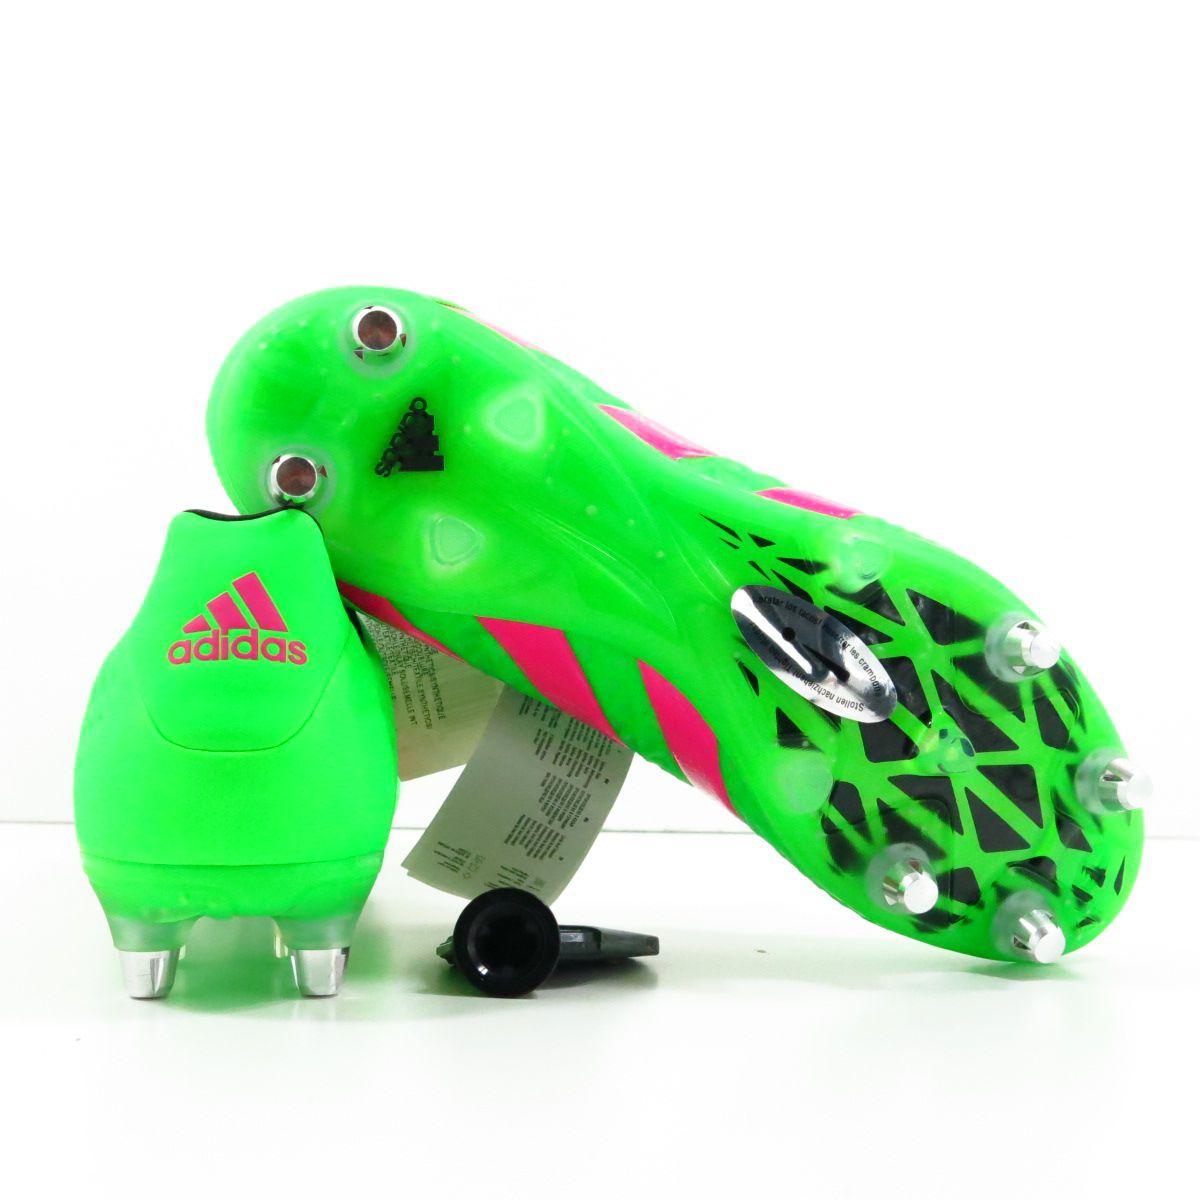 Chuteira Adidas Ace 16.2 SG - Trava Mista